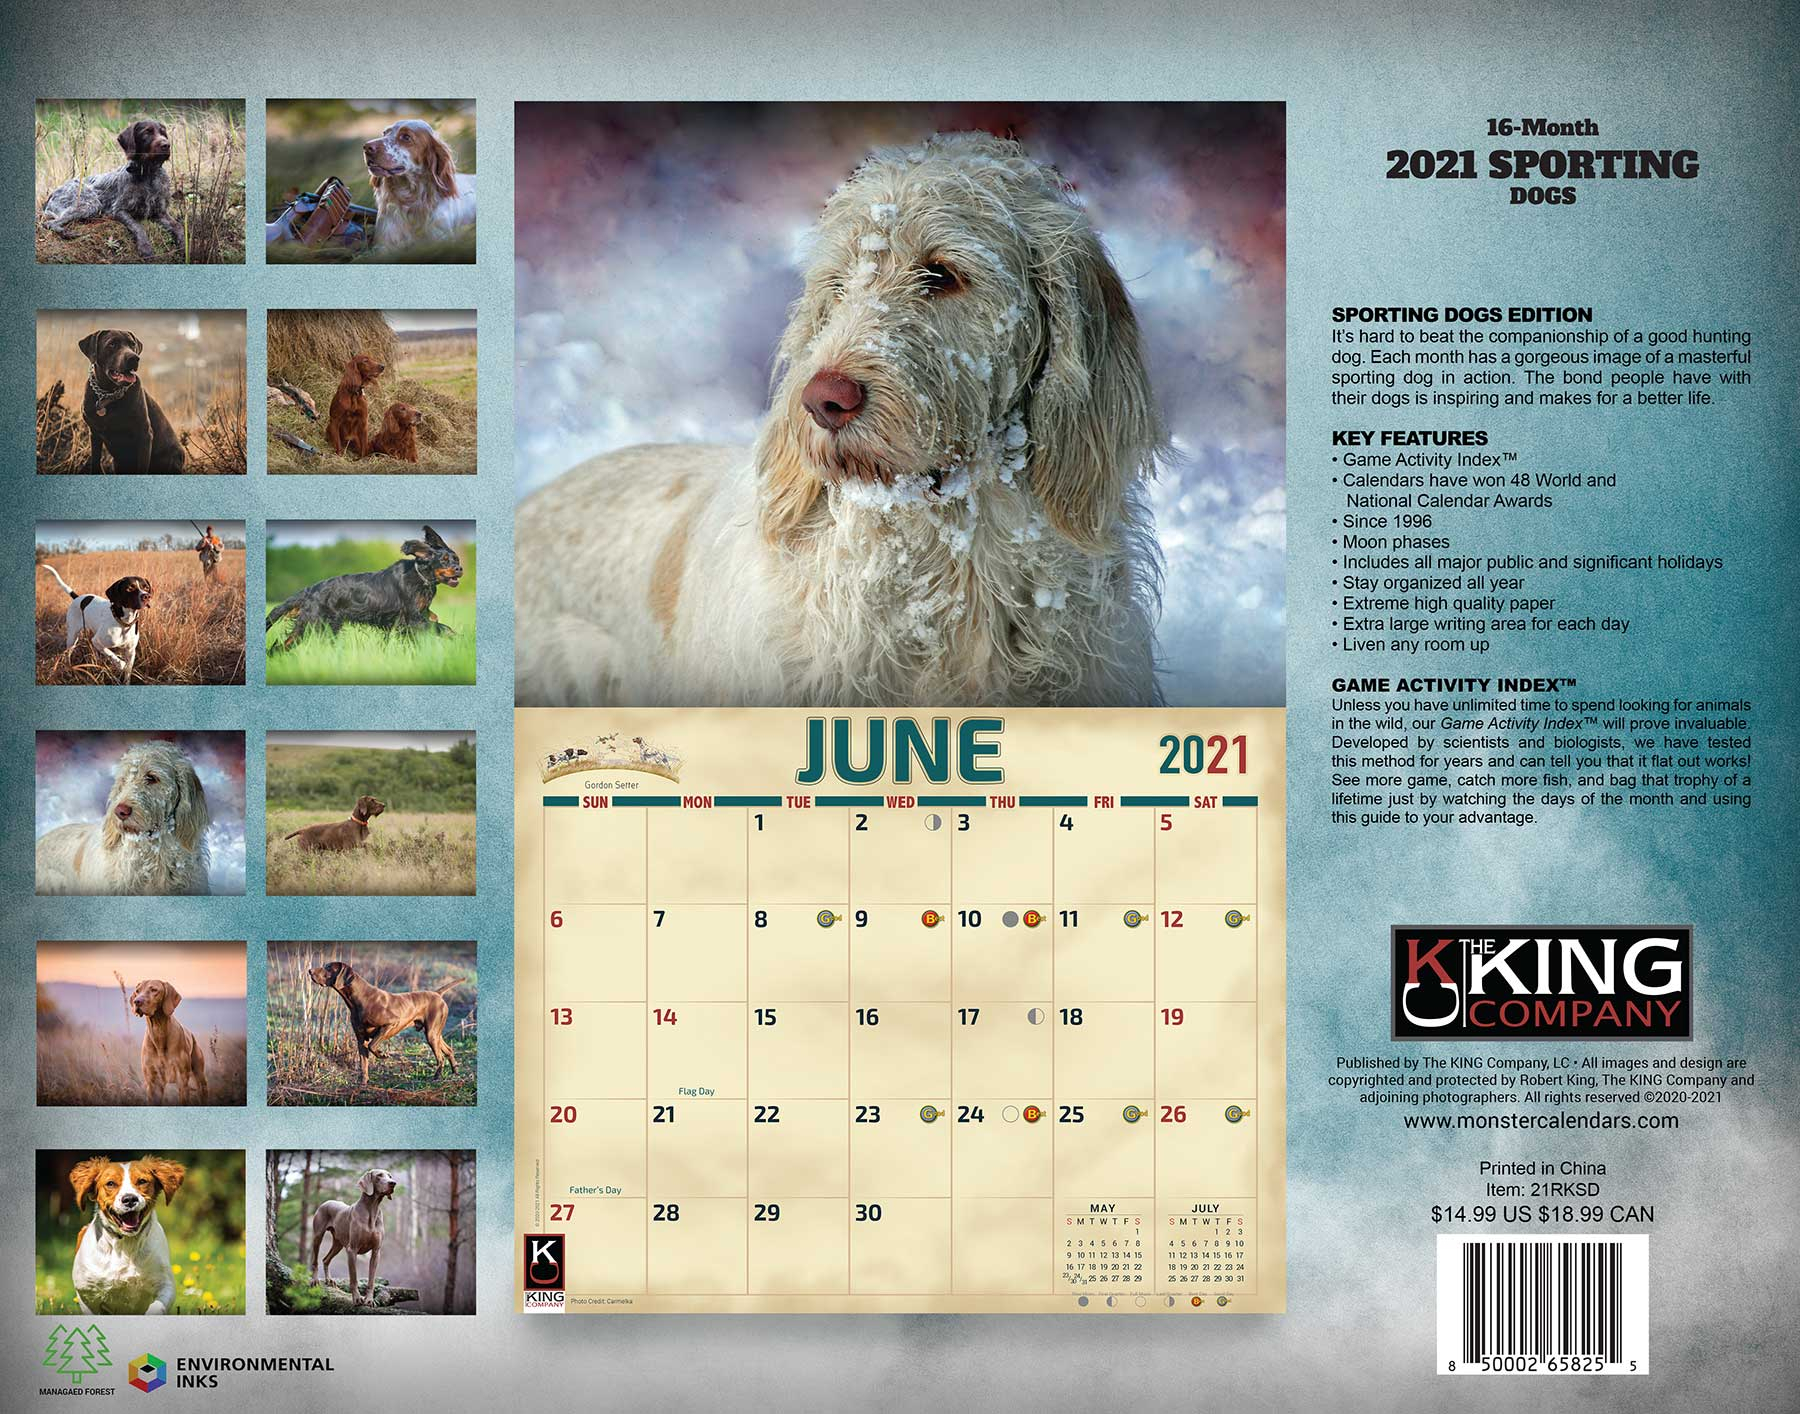 2021 Sporting Dogs Calendar throughout Hunting Calendar 2021